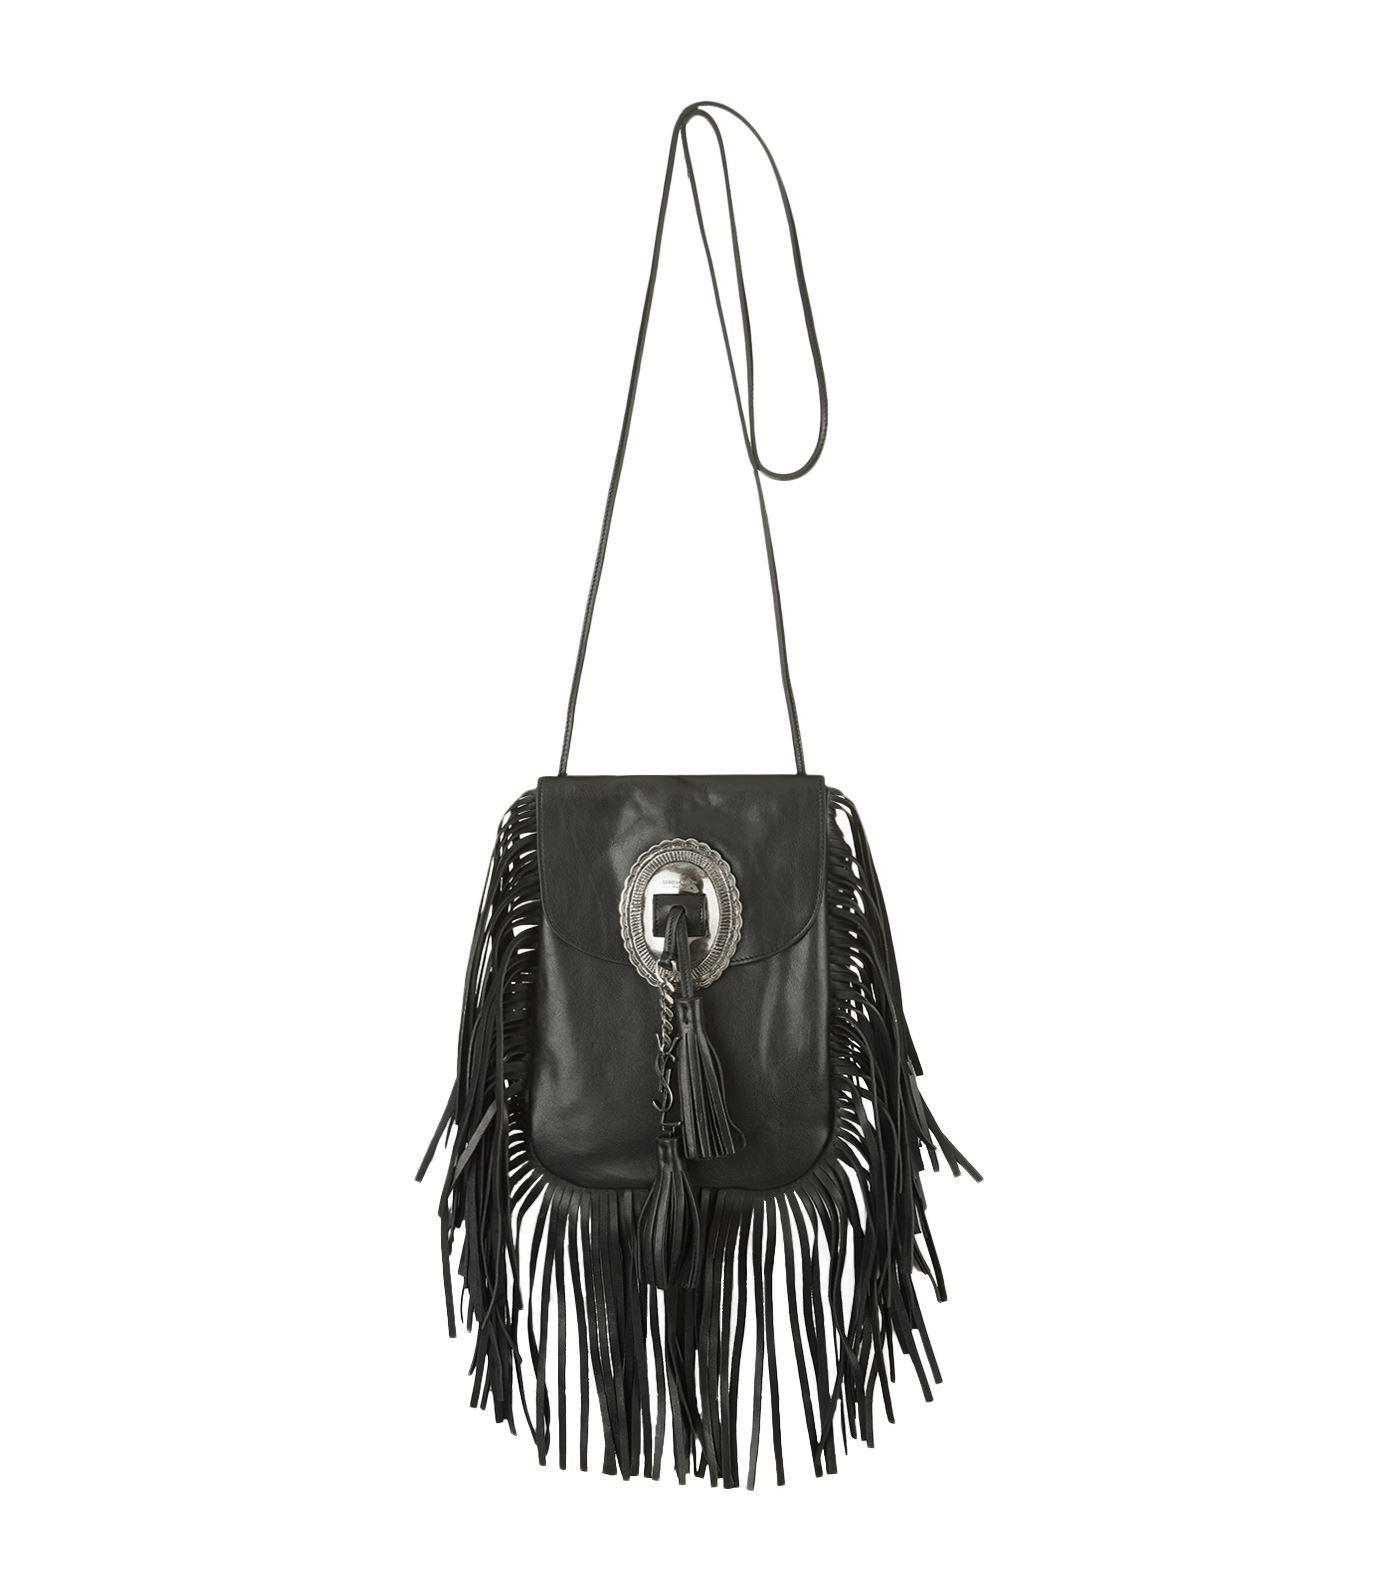 ff0b6b3df147 Saint Laurent Anita Fringed Shoulder Bag in Black - Lyst